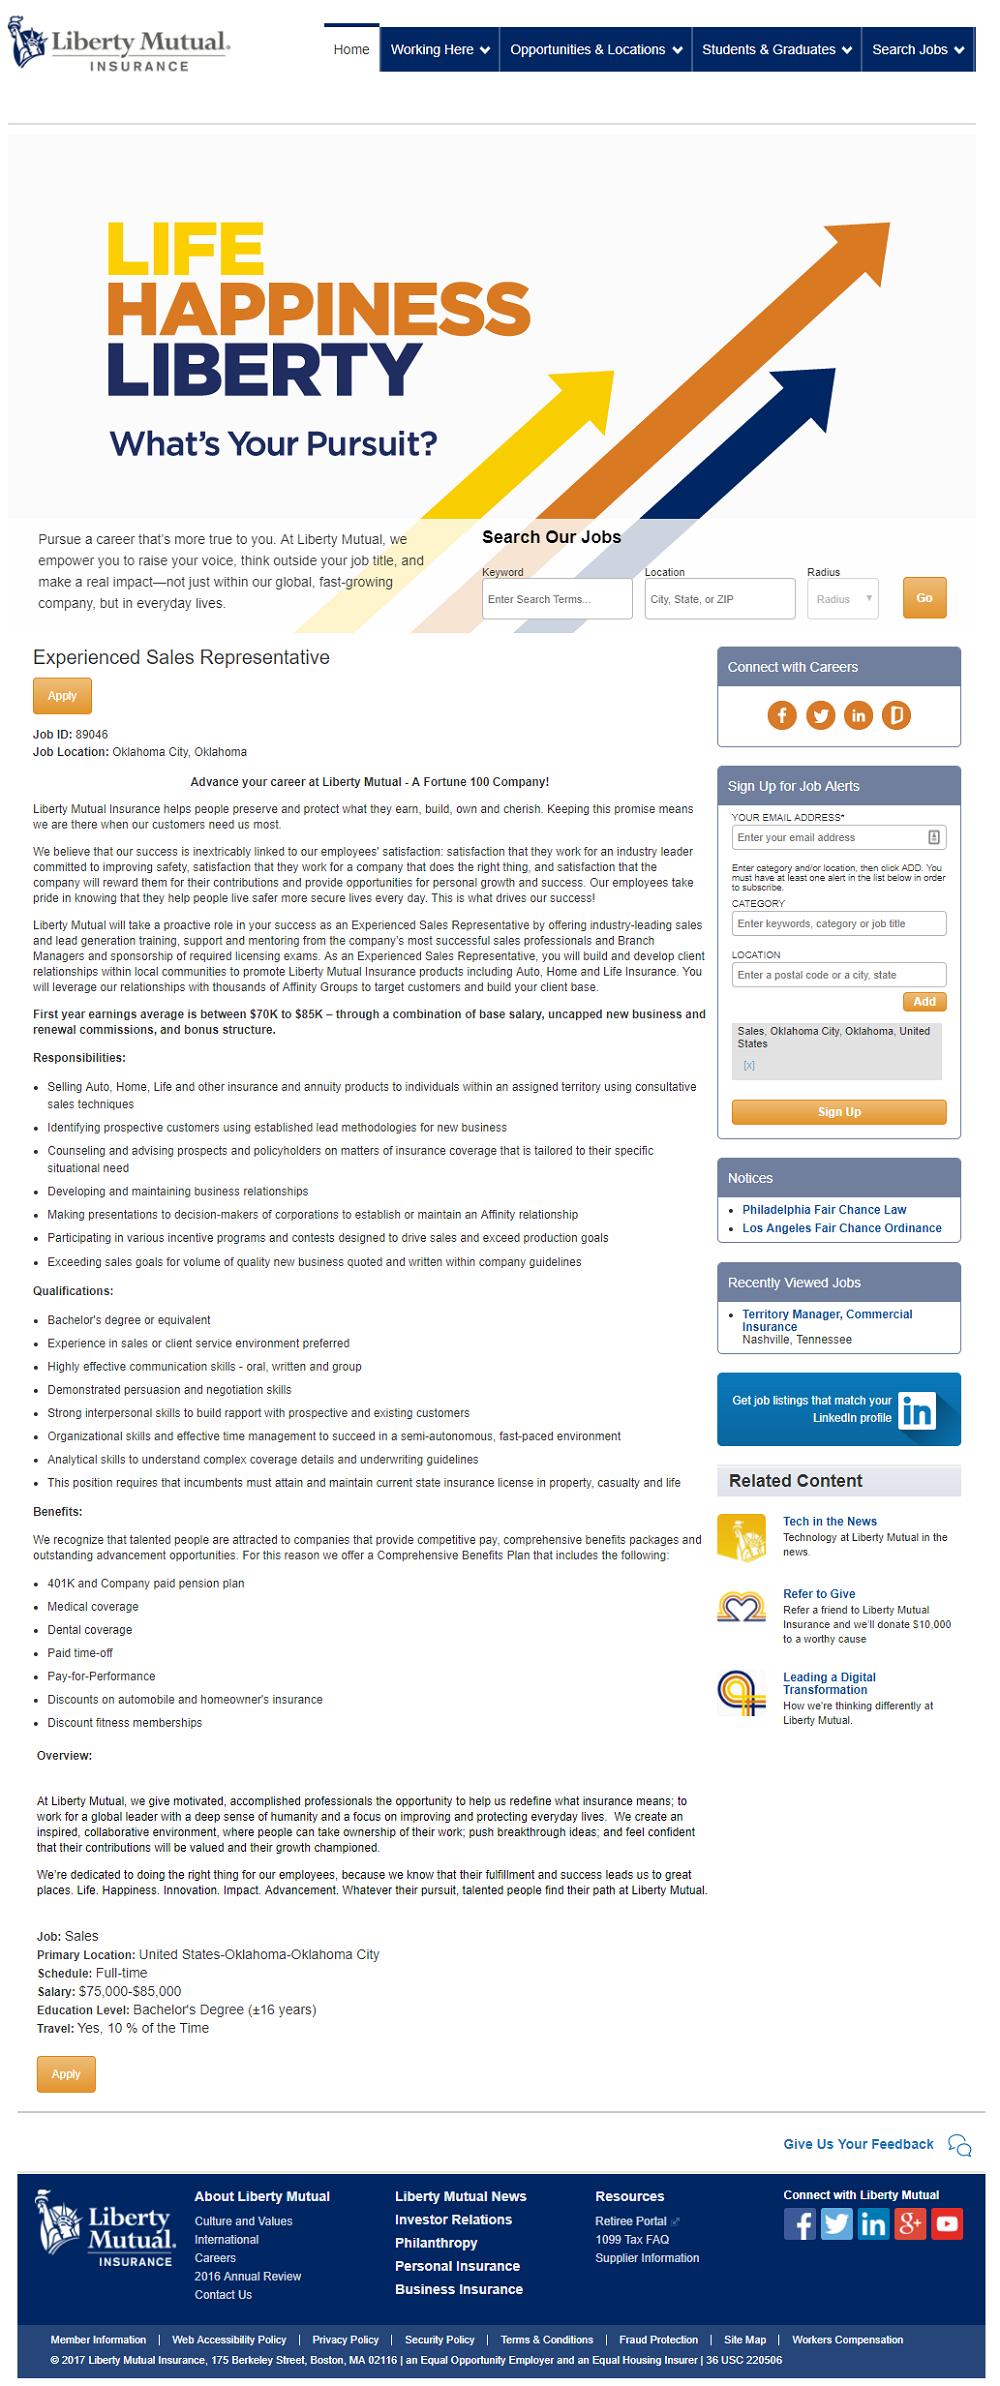 Liberty Mutual Taleo ATS Job Page - Ongig